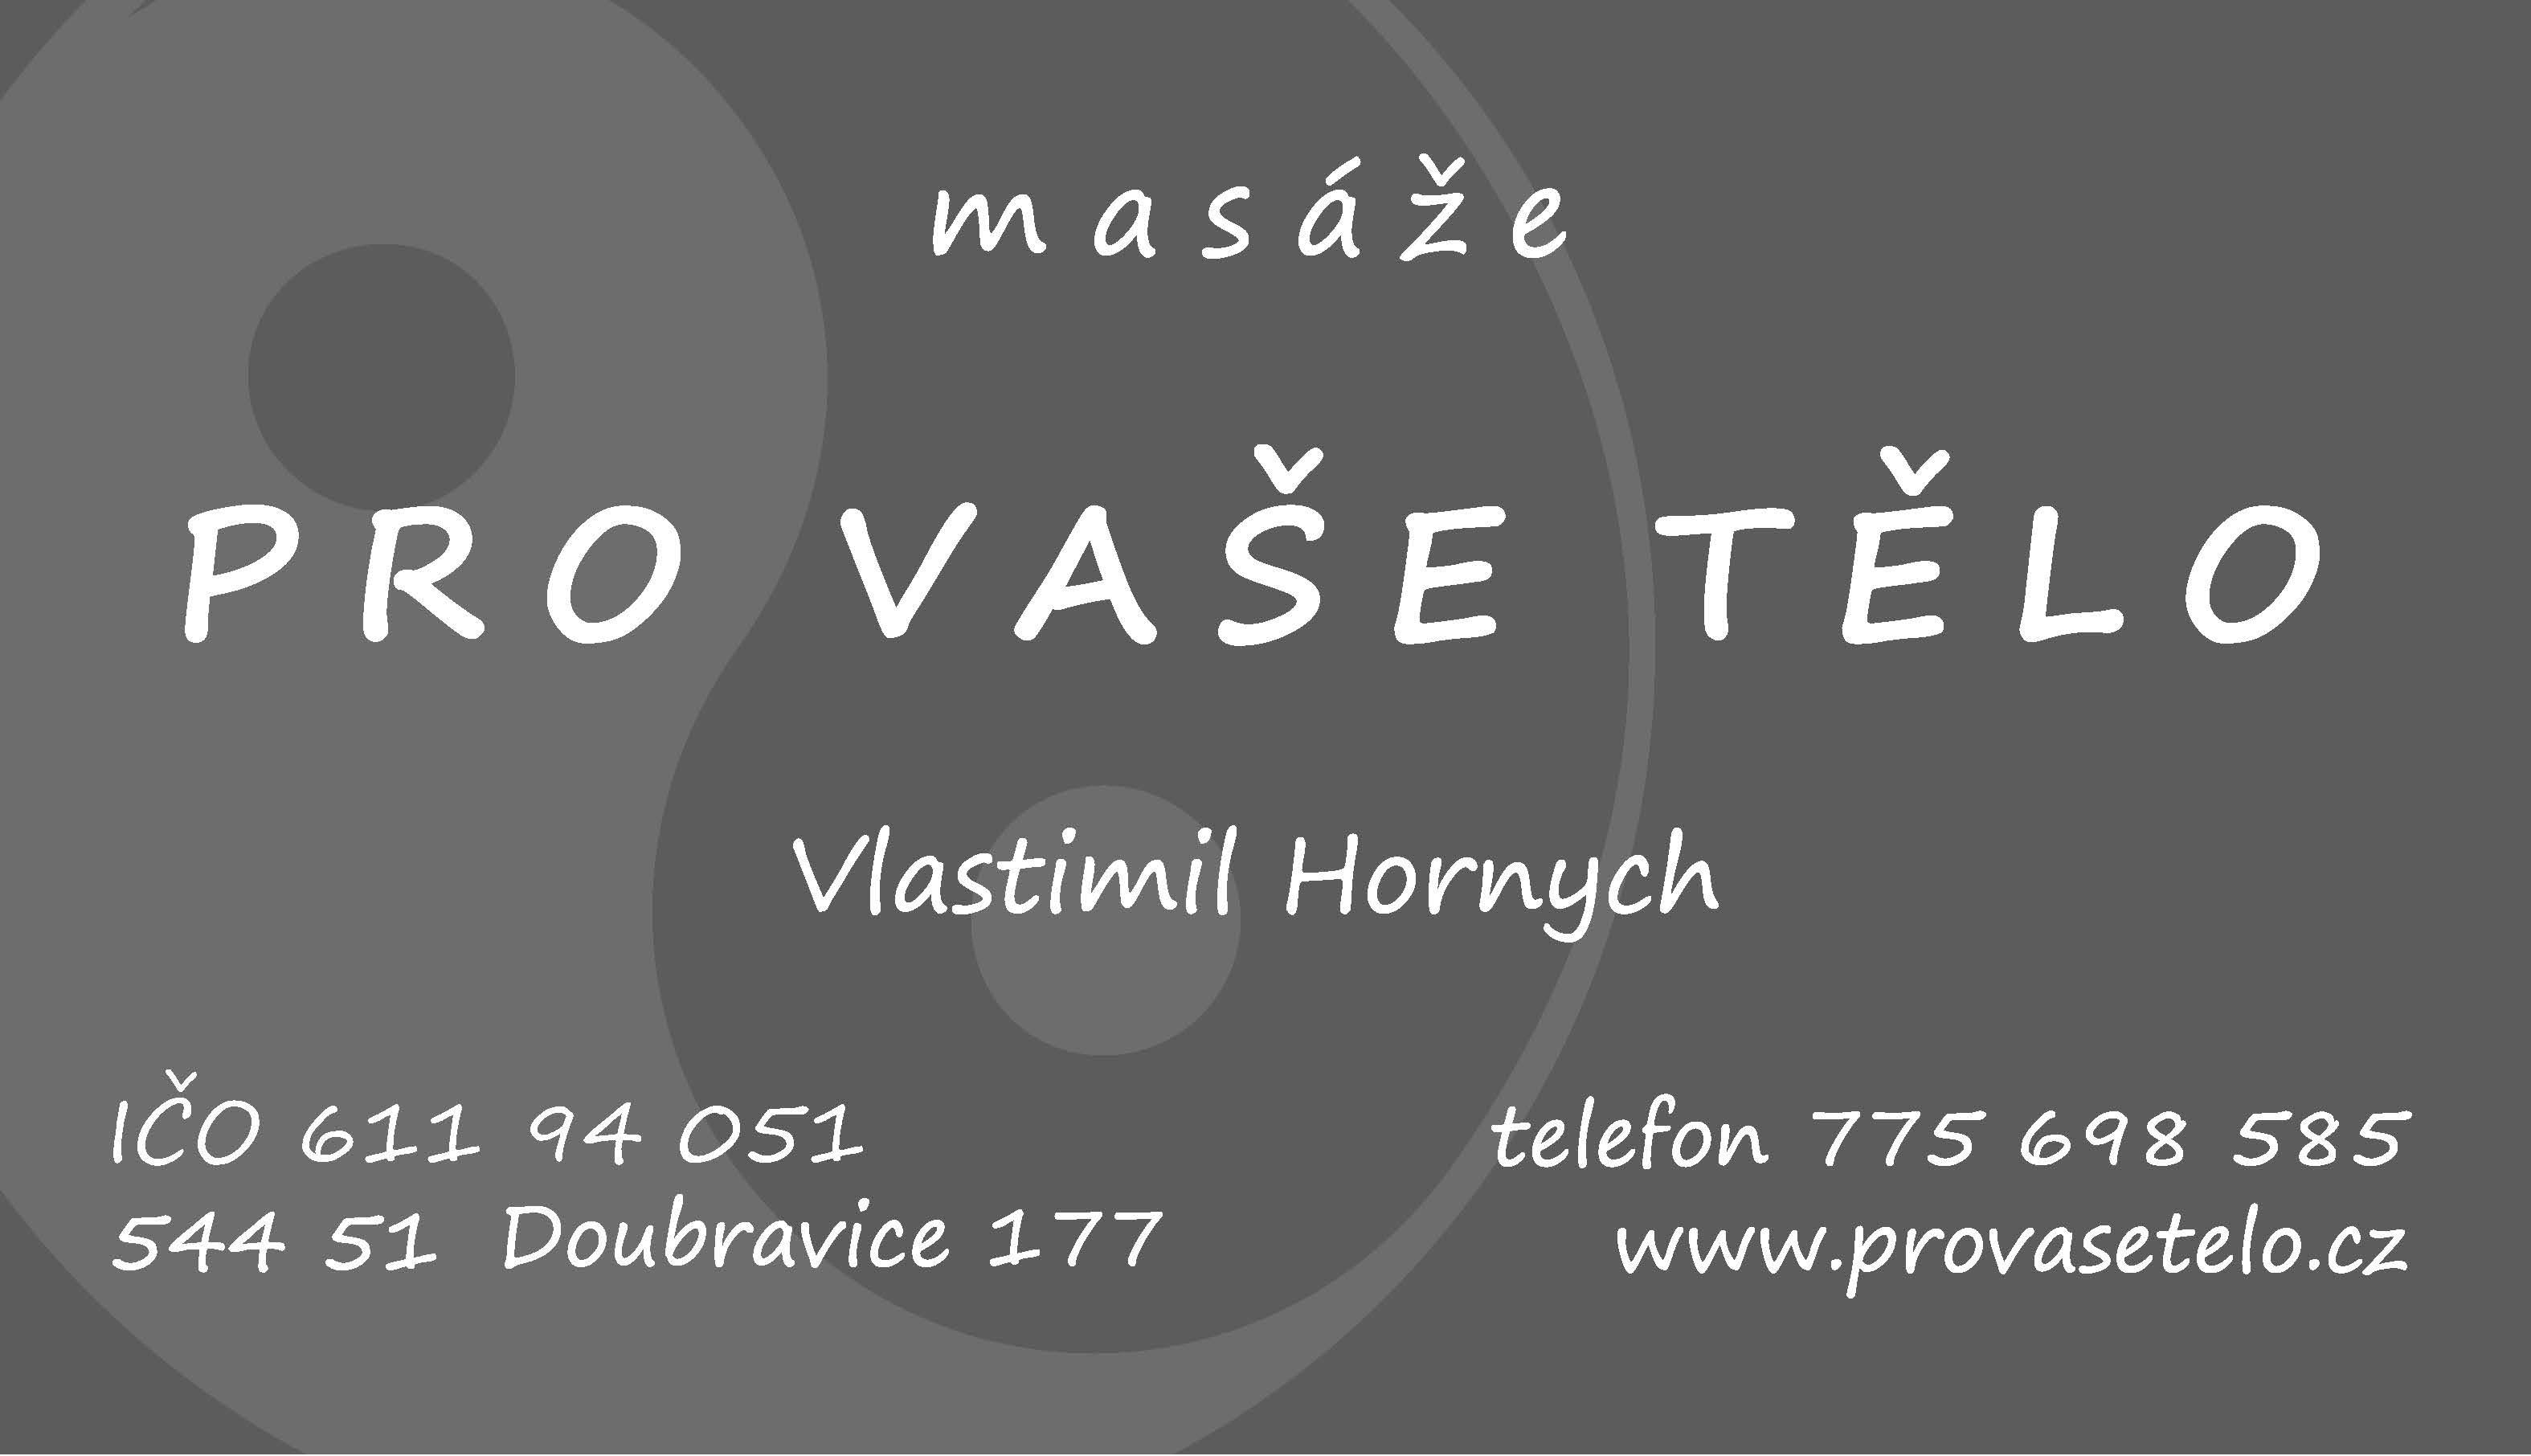 www.provasetelo.cz